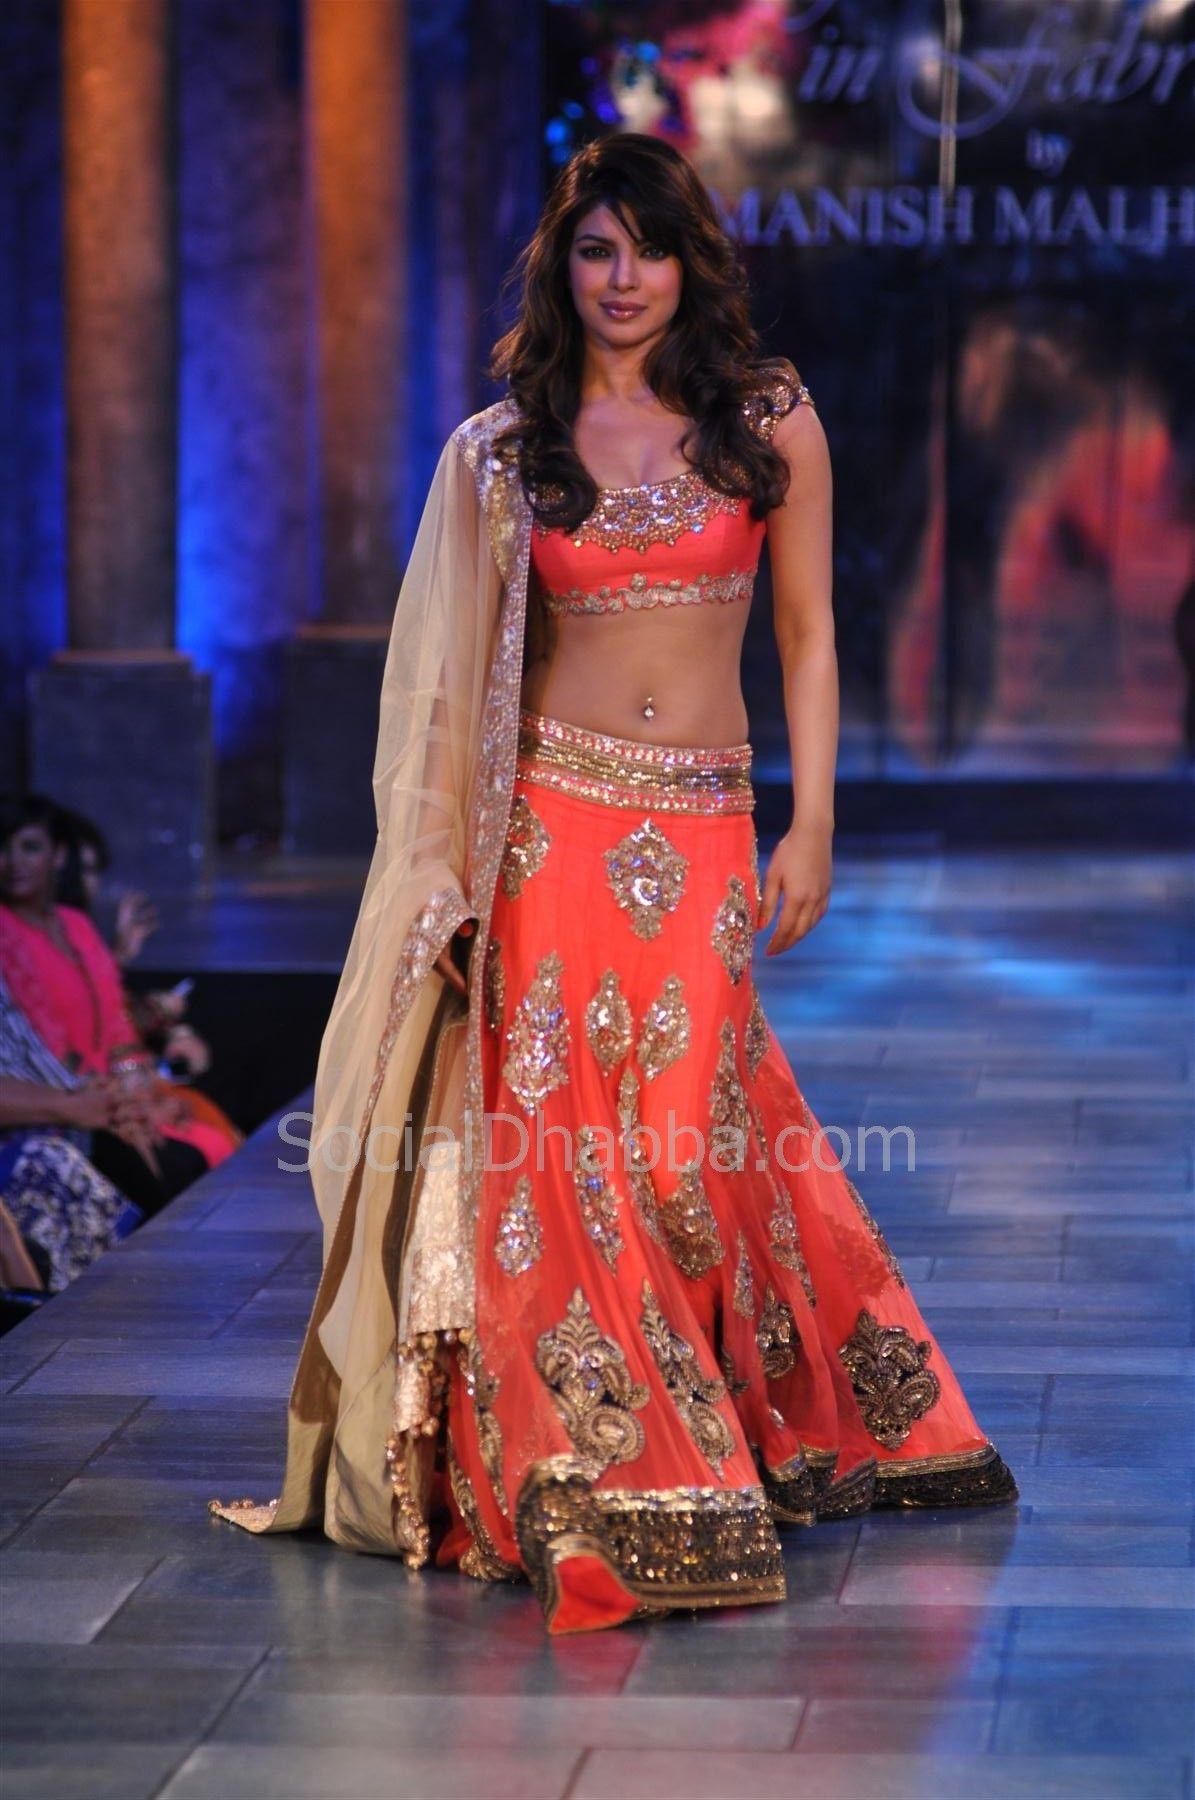 Priyanka Chopra In Orange Lengha By Manish Malhotra Asian Indian